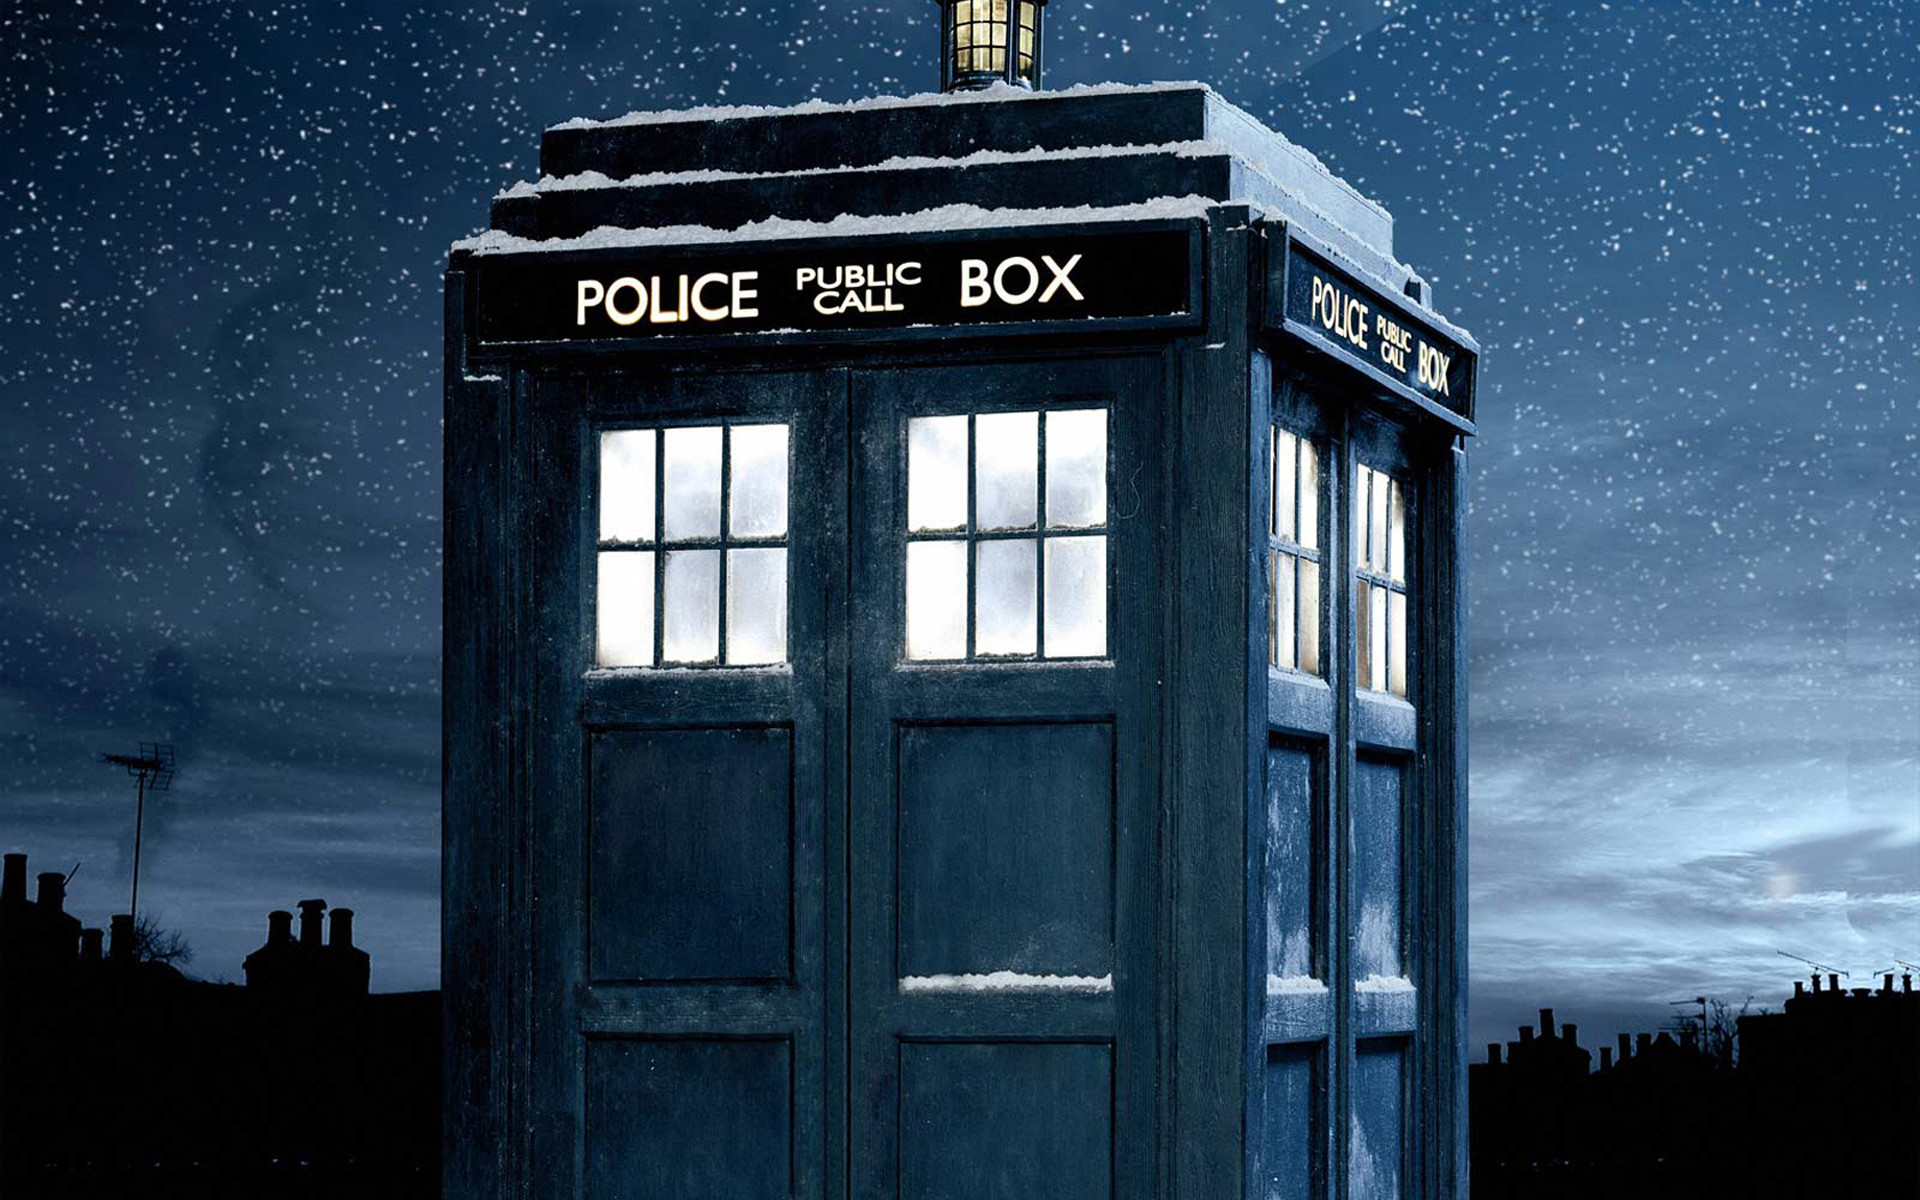 Doctor Who Ipad wallpaper – 1115199